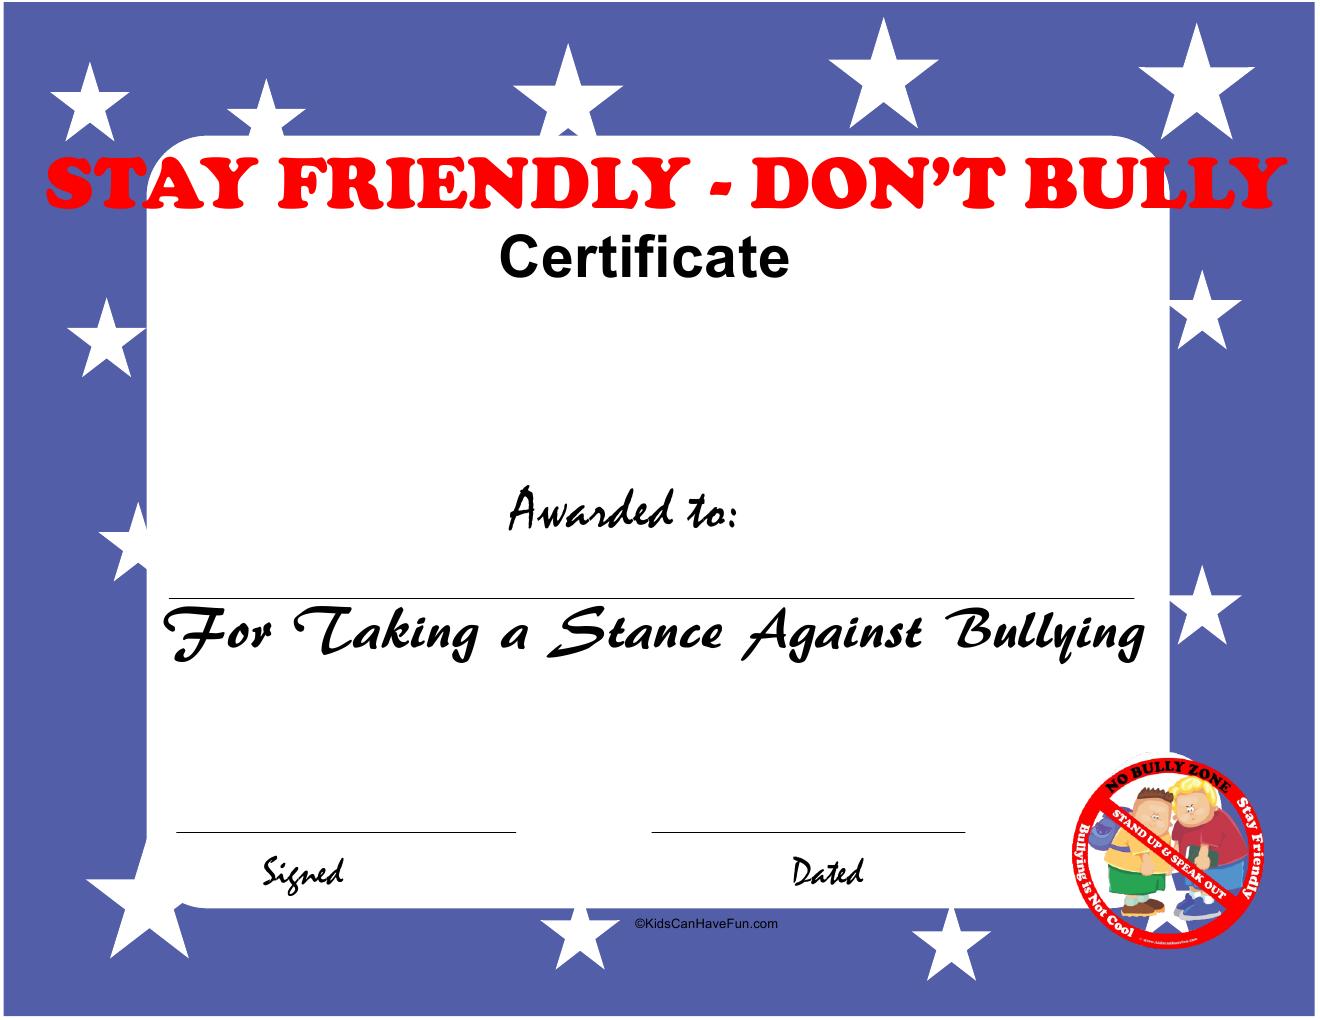 Stay Friendly